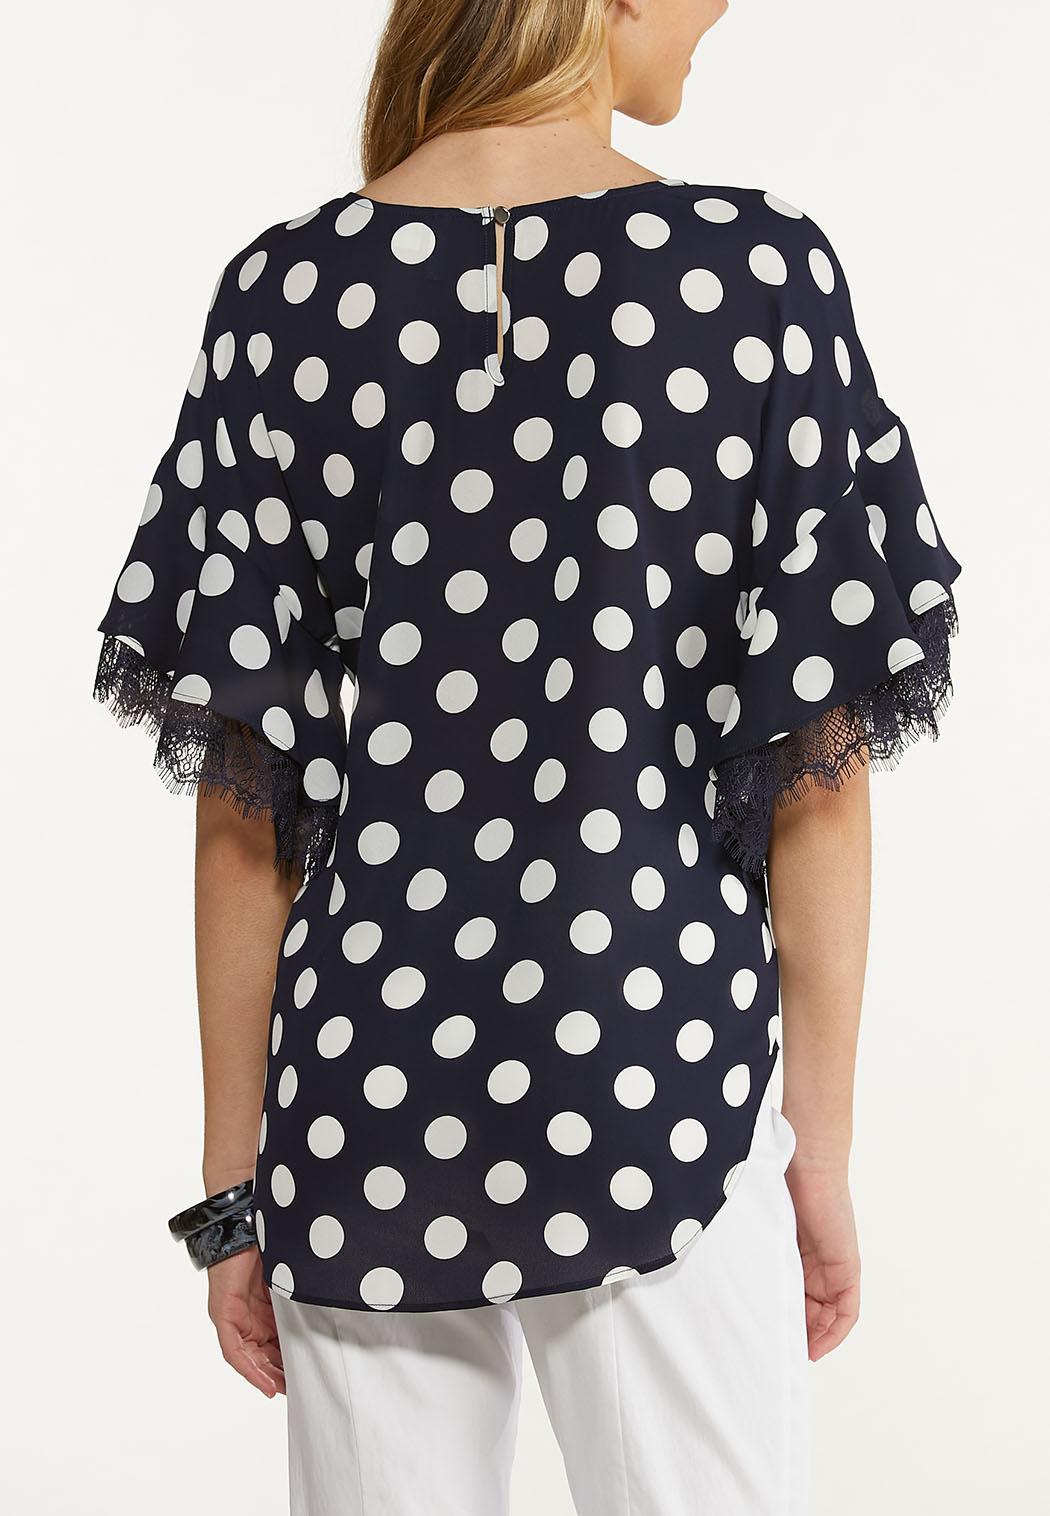 Polka Dot Lace Trim Top (Item #44609452)